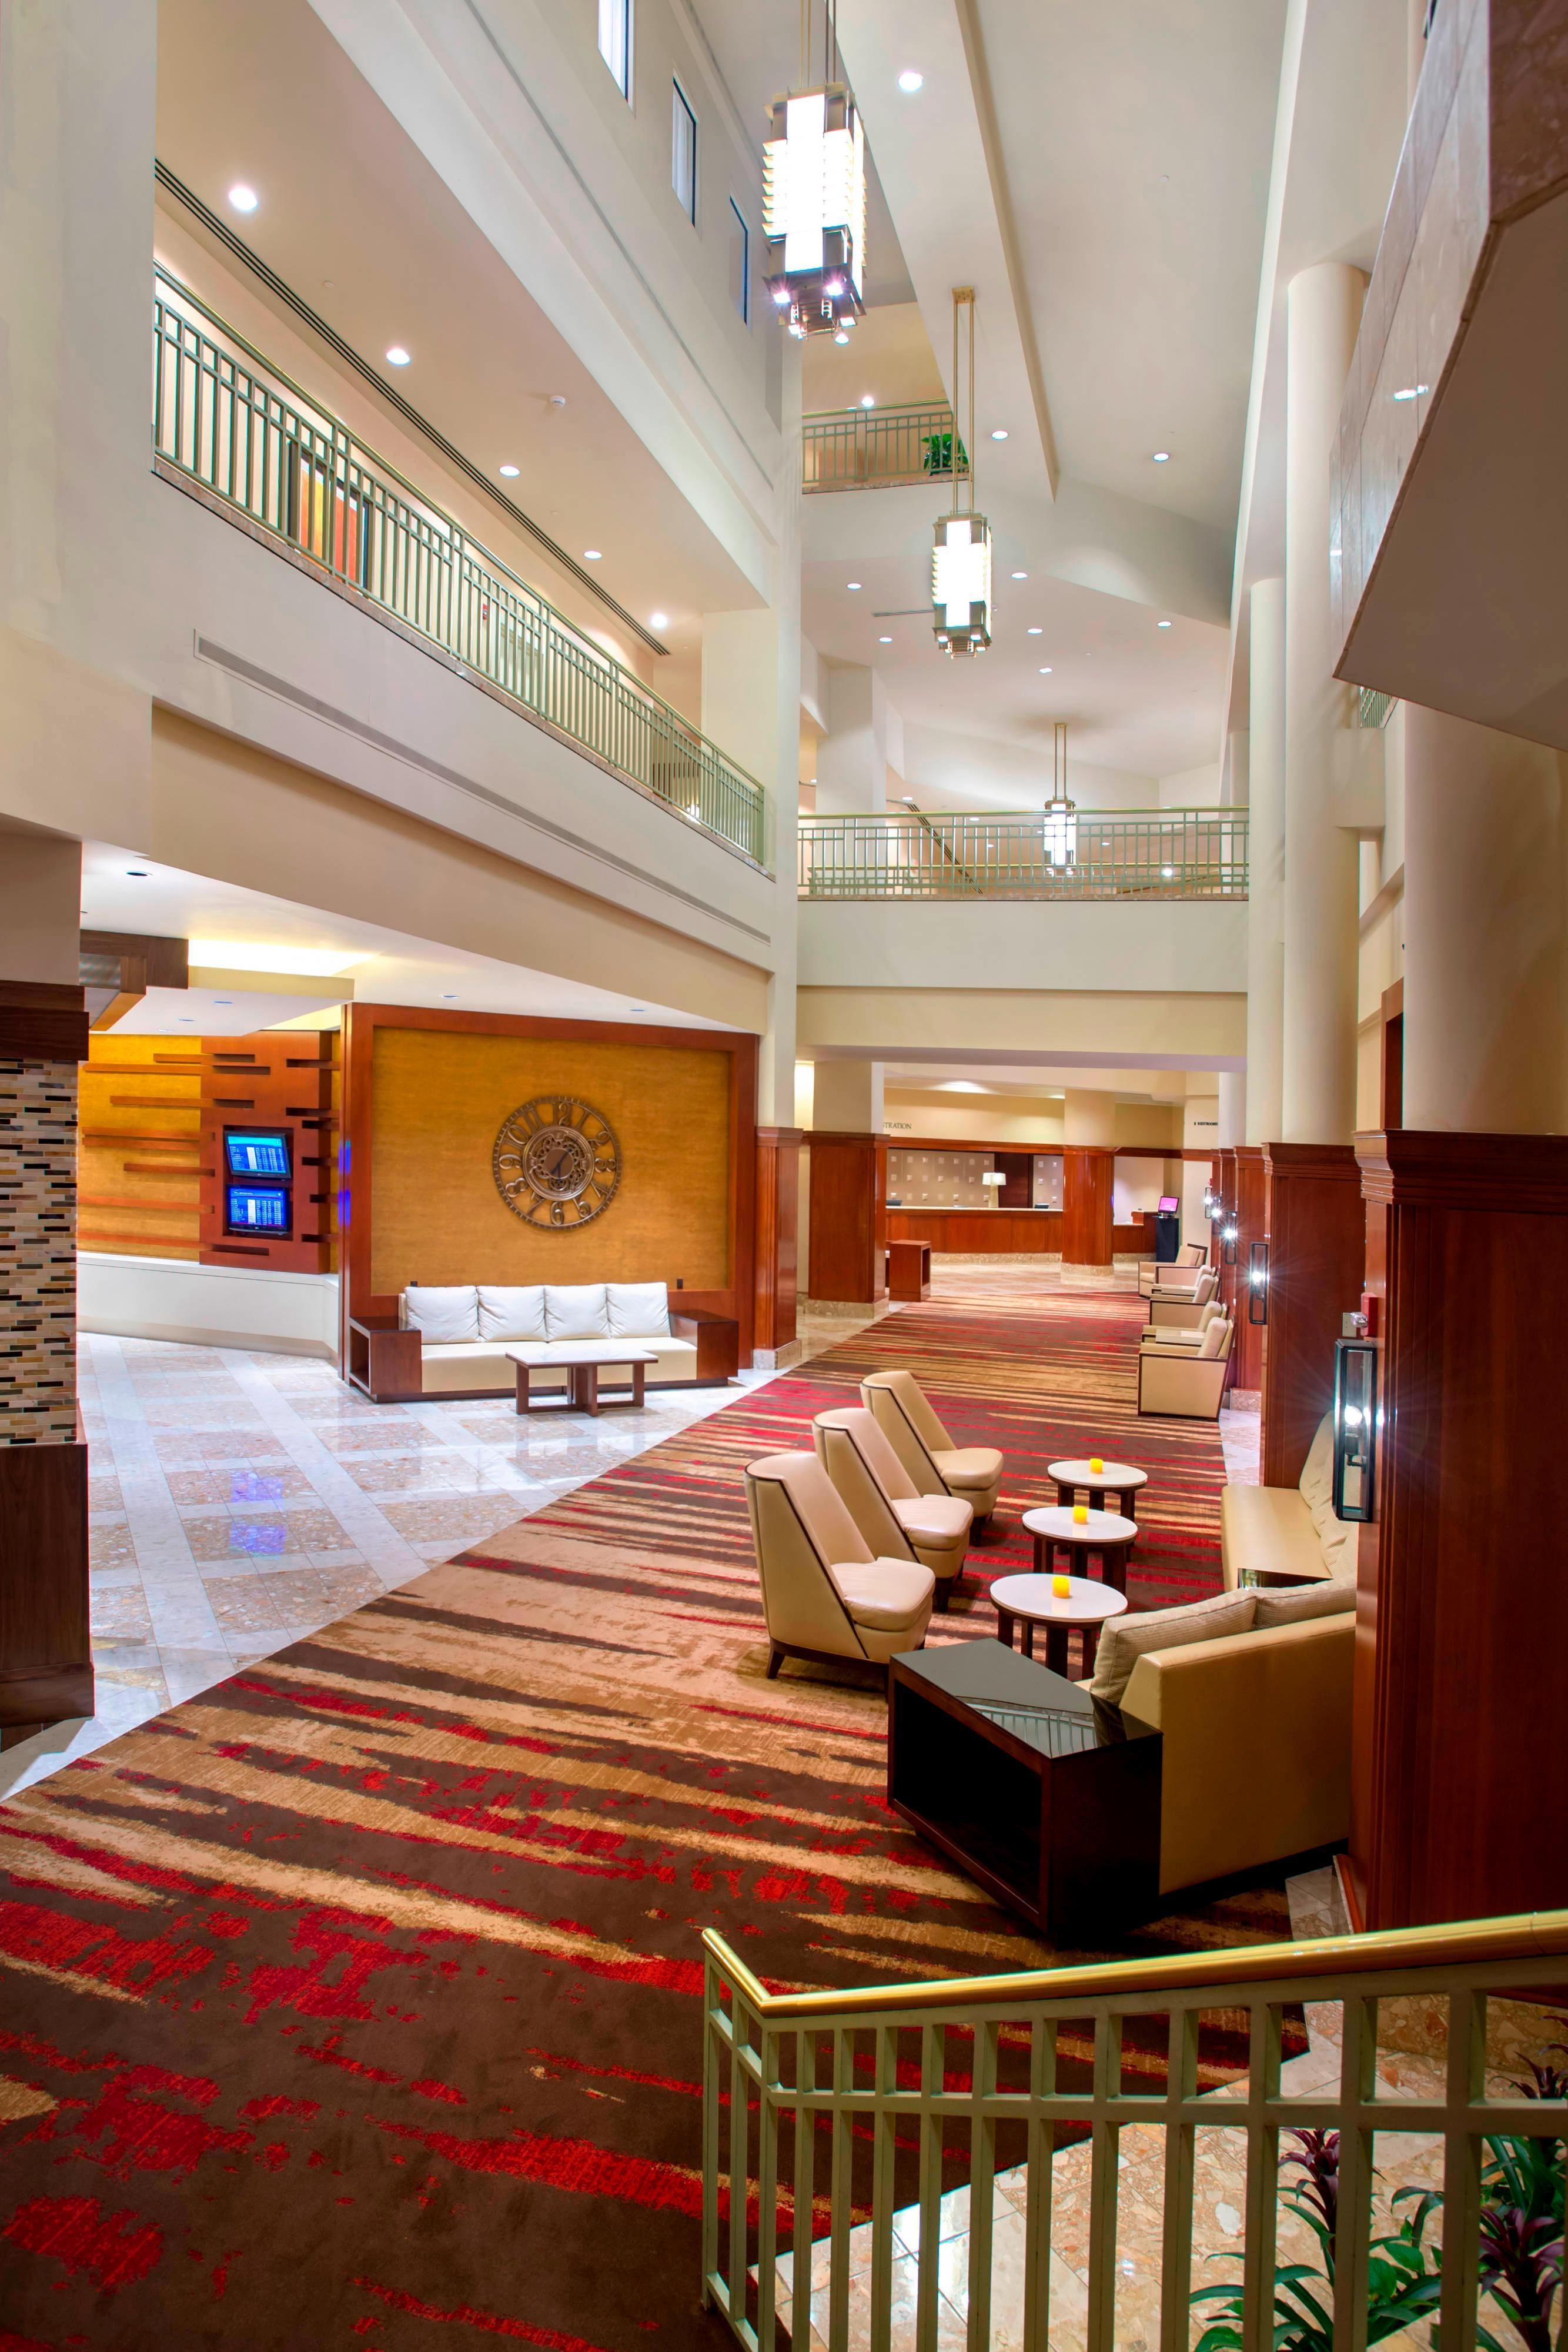 Philadelphia airport hotel lobby